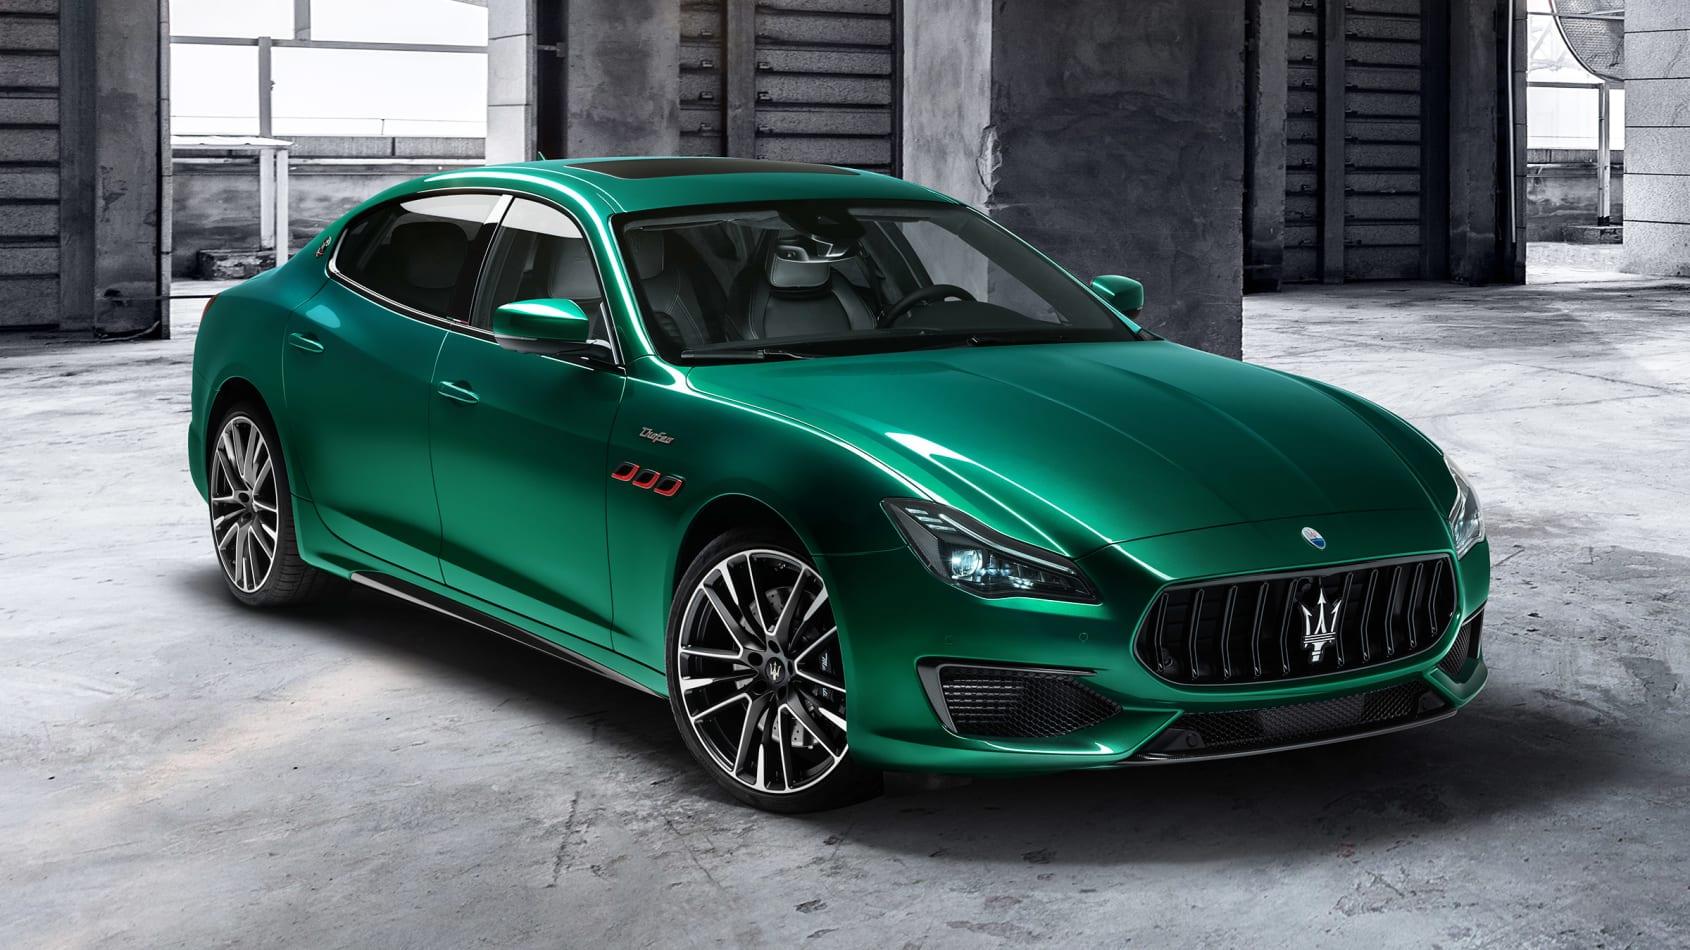 [Image: Maserati%20Quattroporte%20Trofeo-7.jpg]